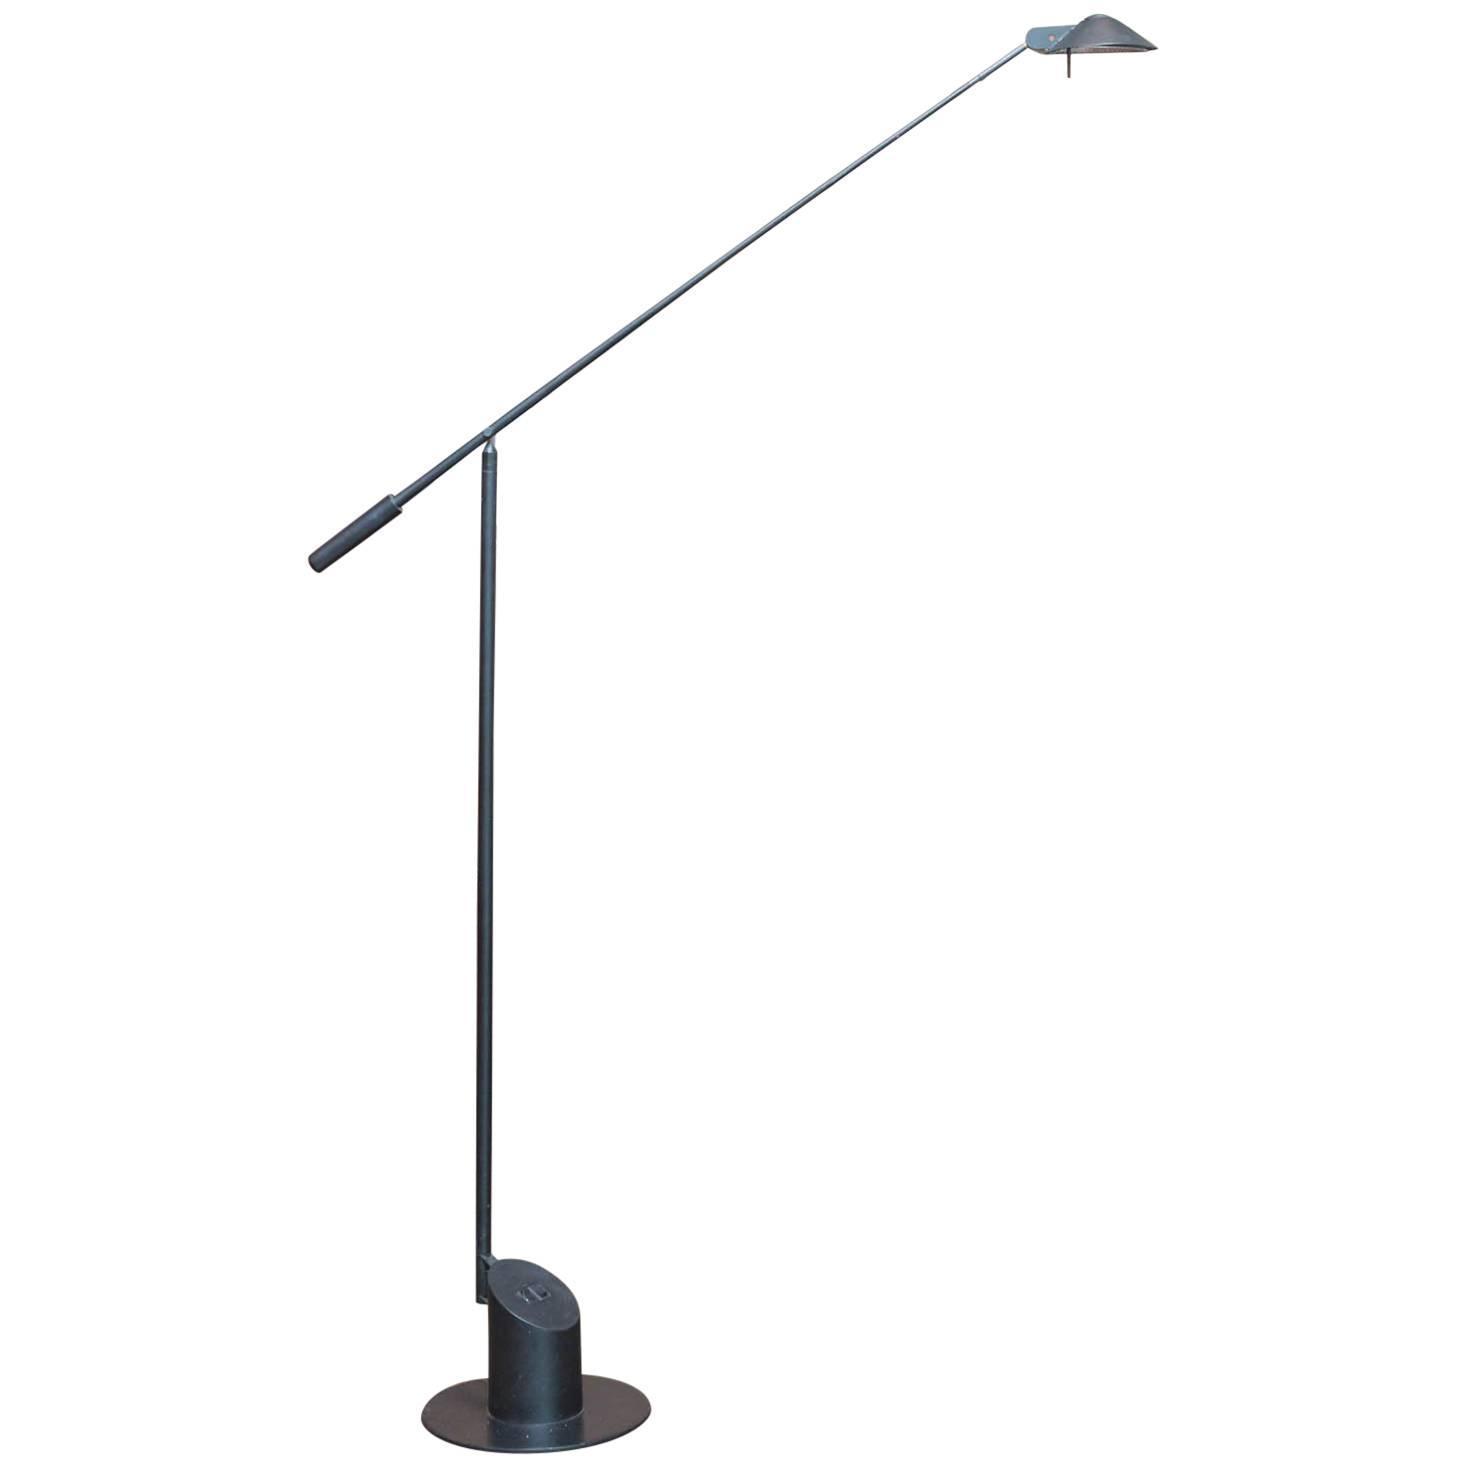 rudi stern neon floor lamp for george kovacs at stdibs - robert sonneman for george kovacs feather floor lamp